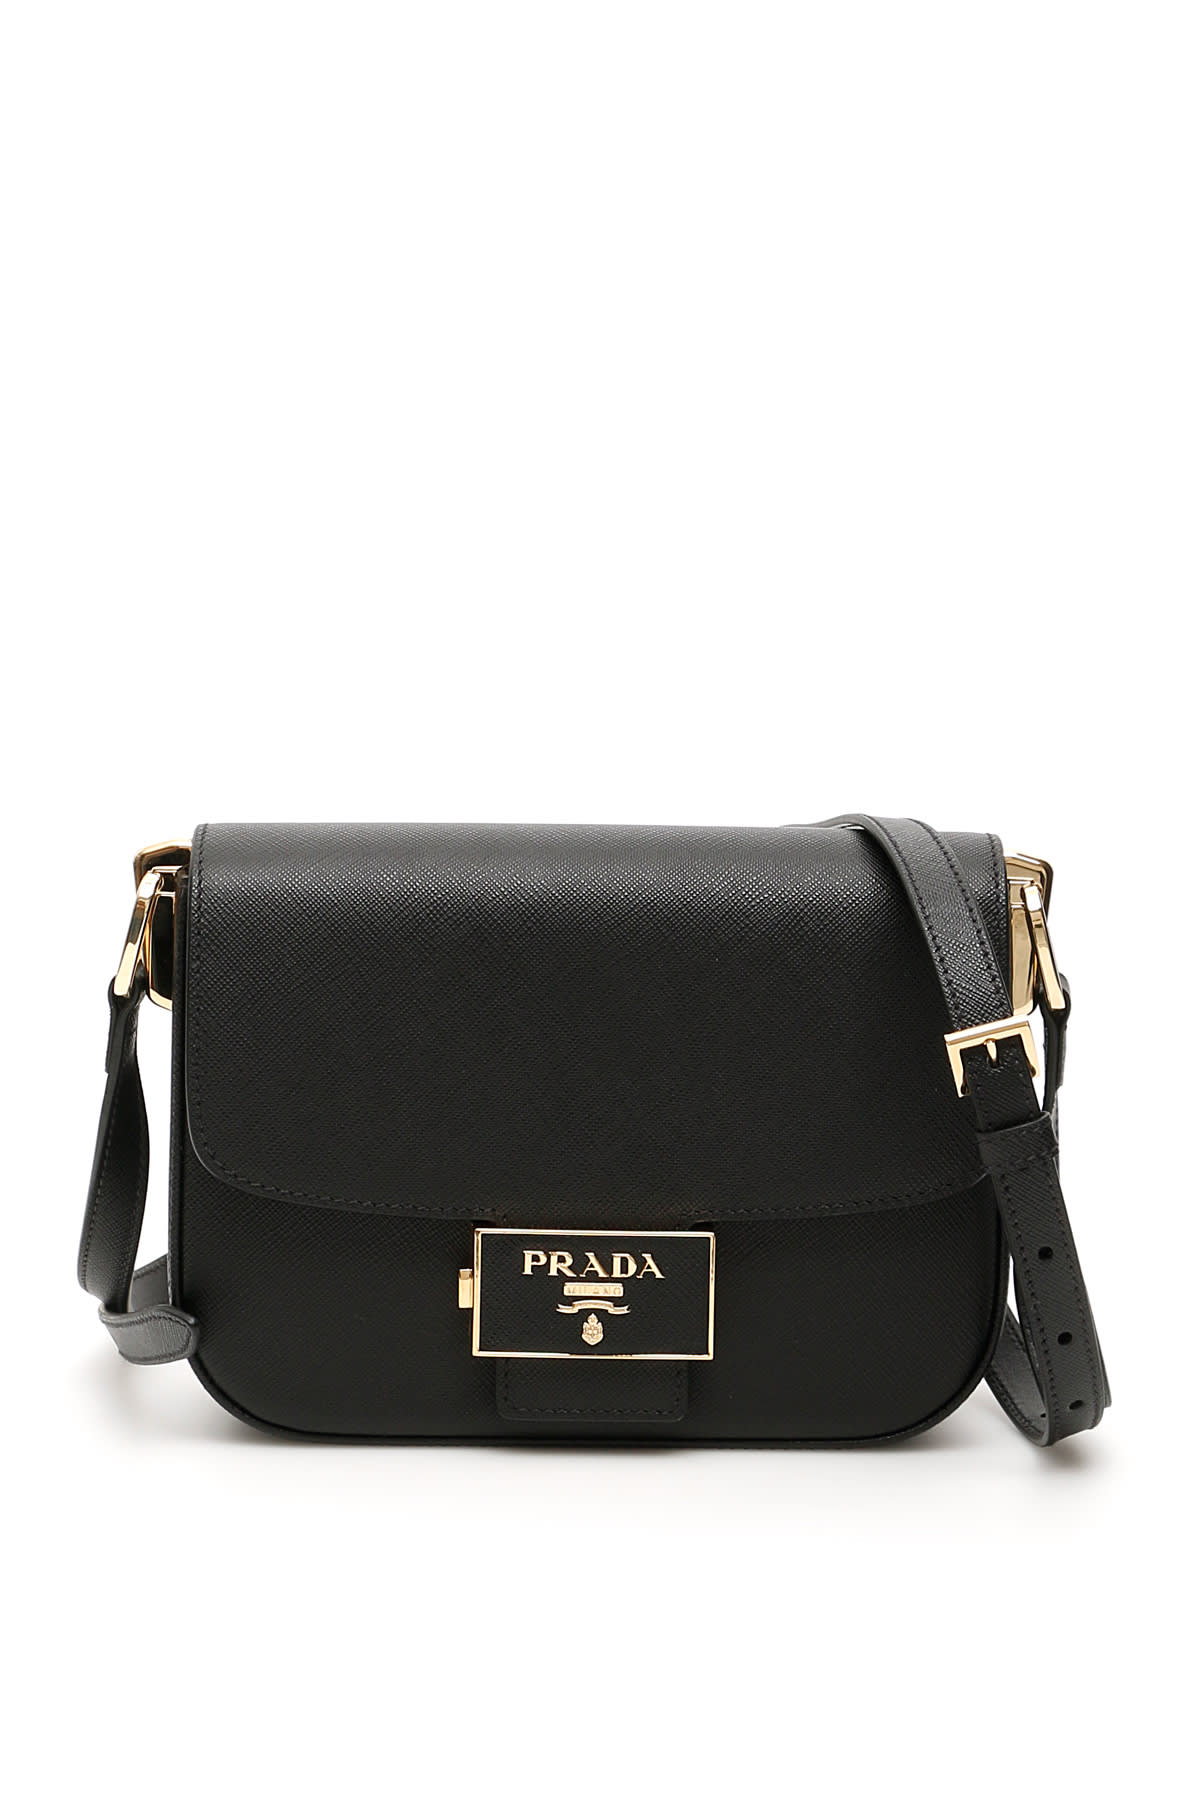 Prada Embleme Bag